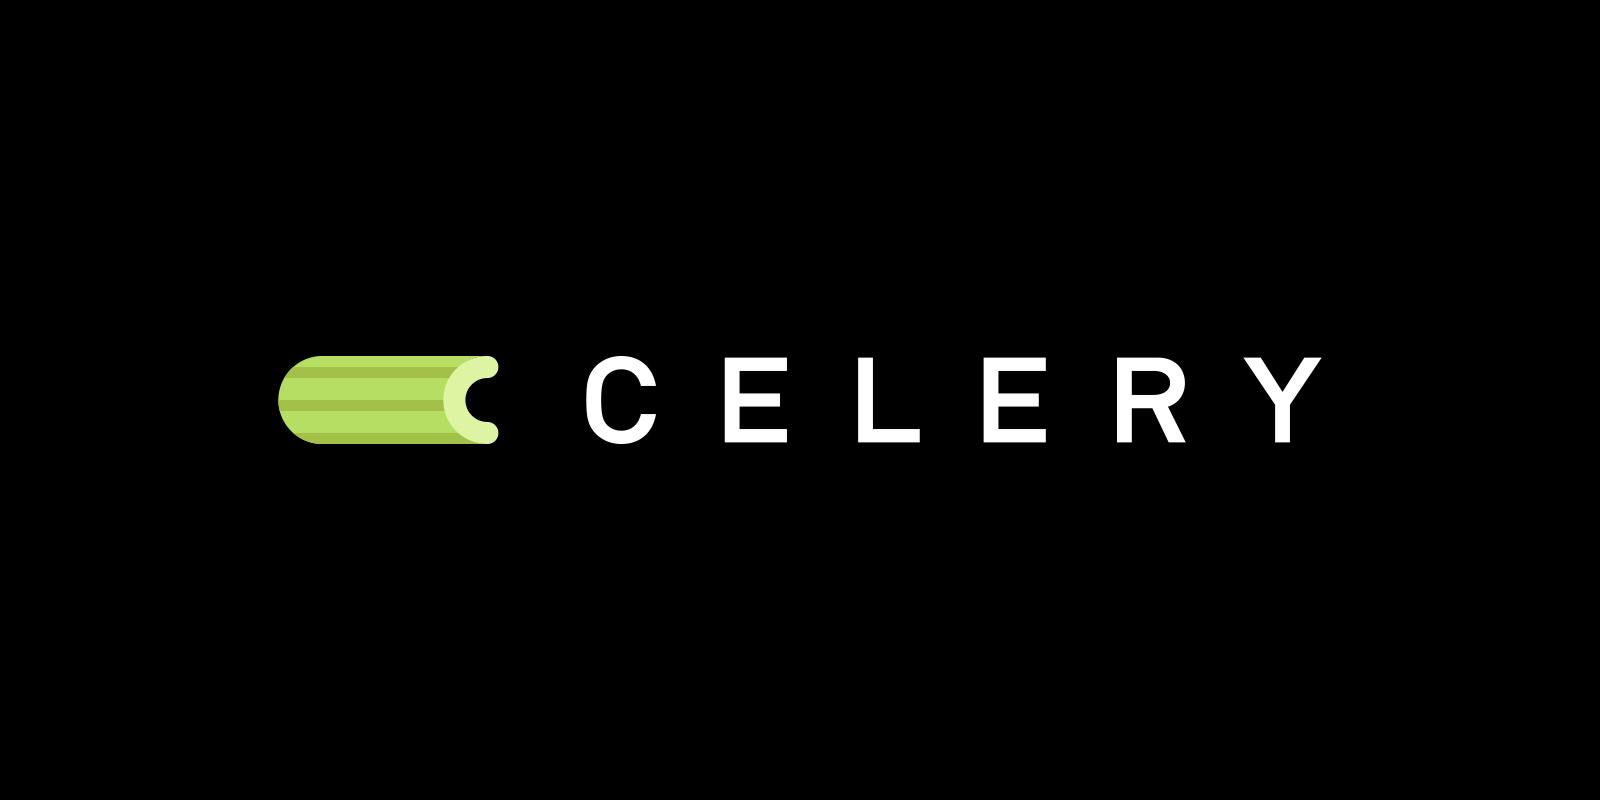 Celery 02